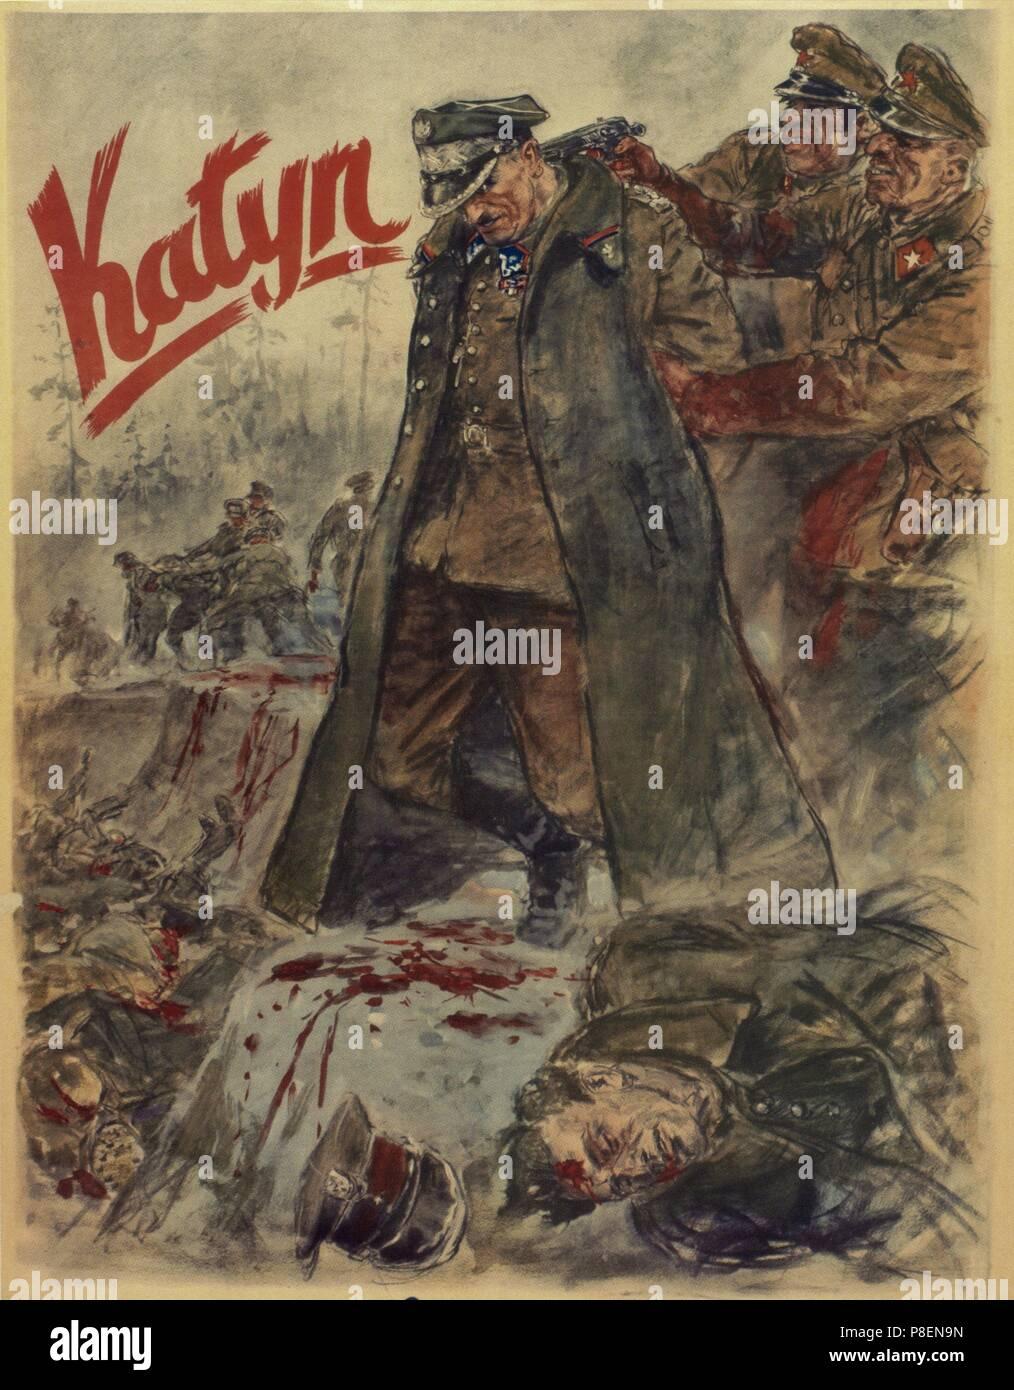 The Katyn massacre (Nazi propaganda poster). Museum: PRIVATE COLLECTION. - Stock Image